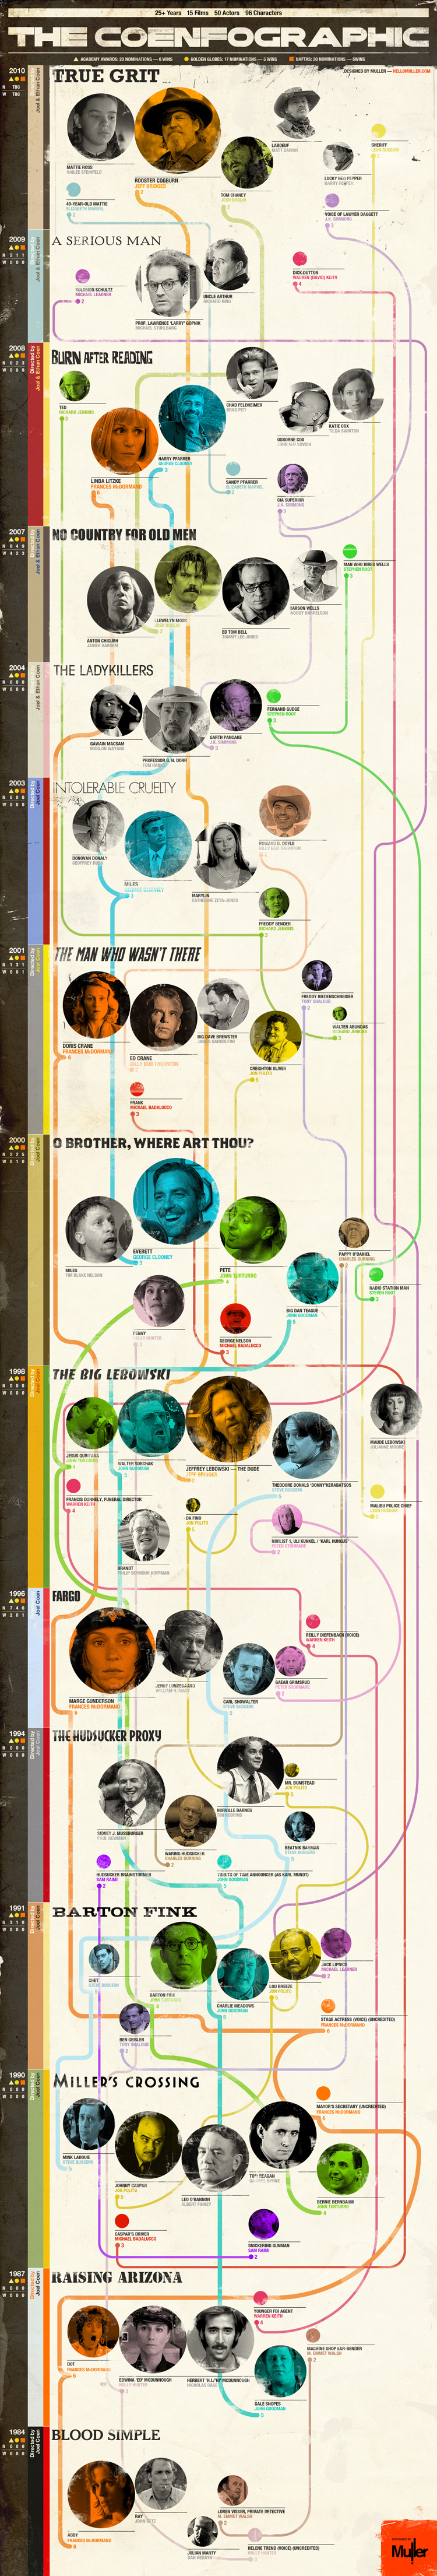 Coen-Infographic-Muller